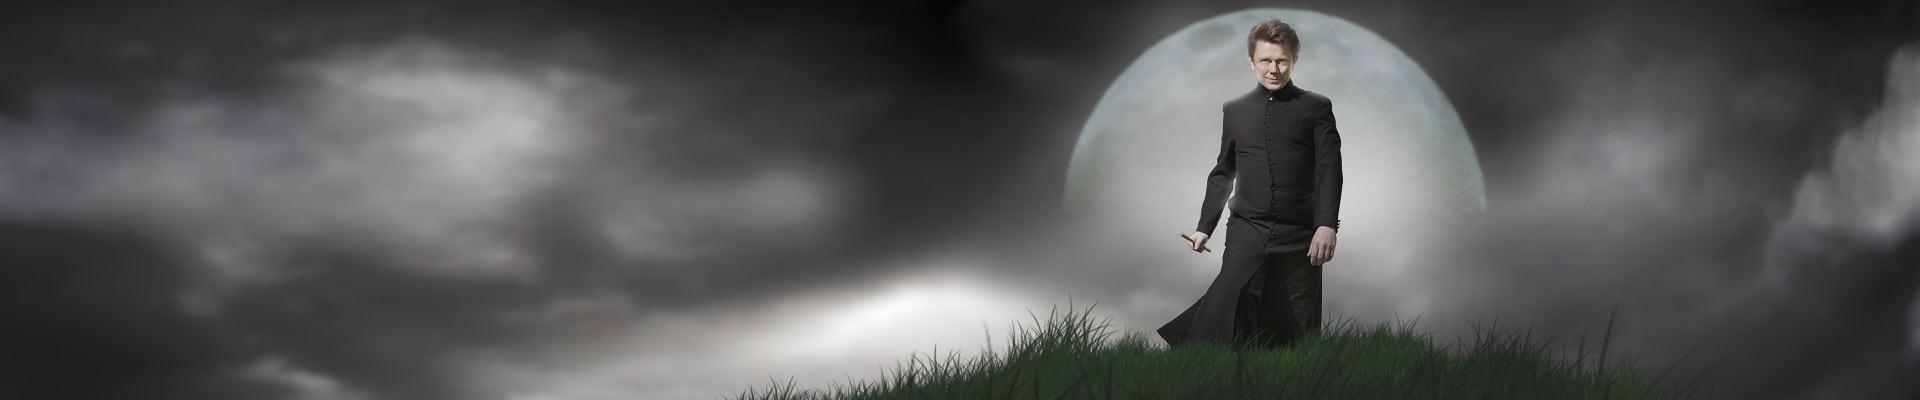 Tom Stone moon